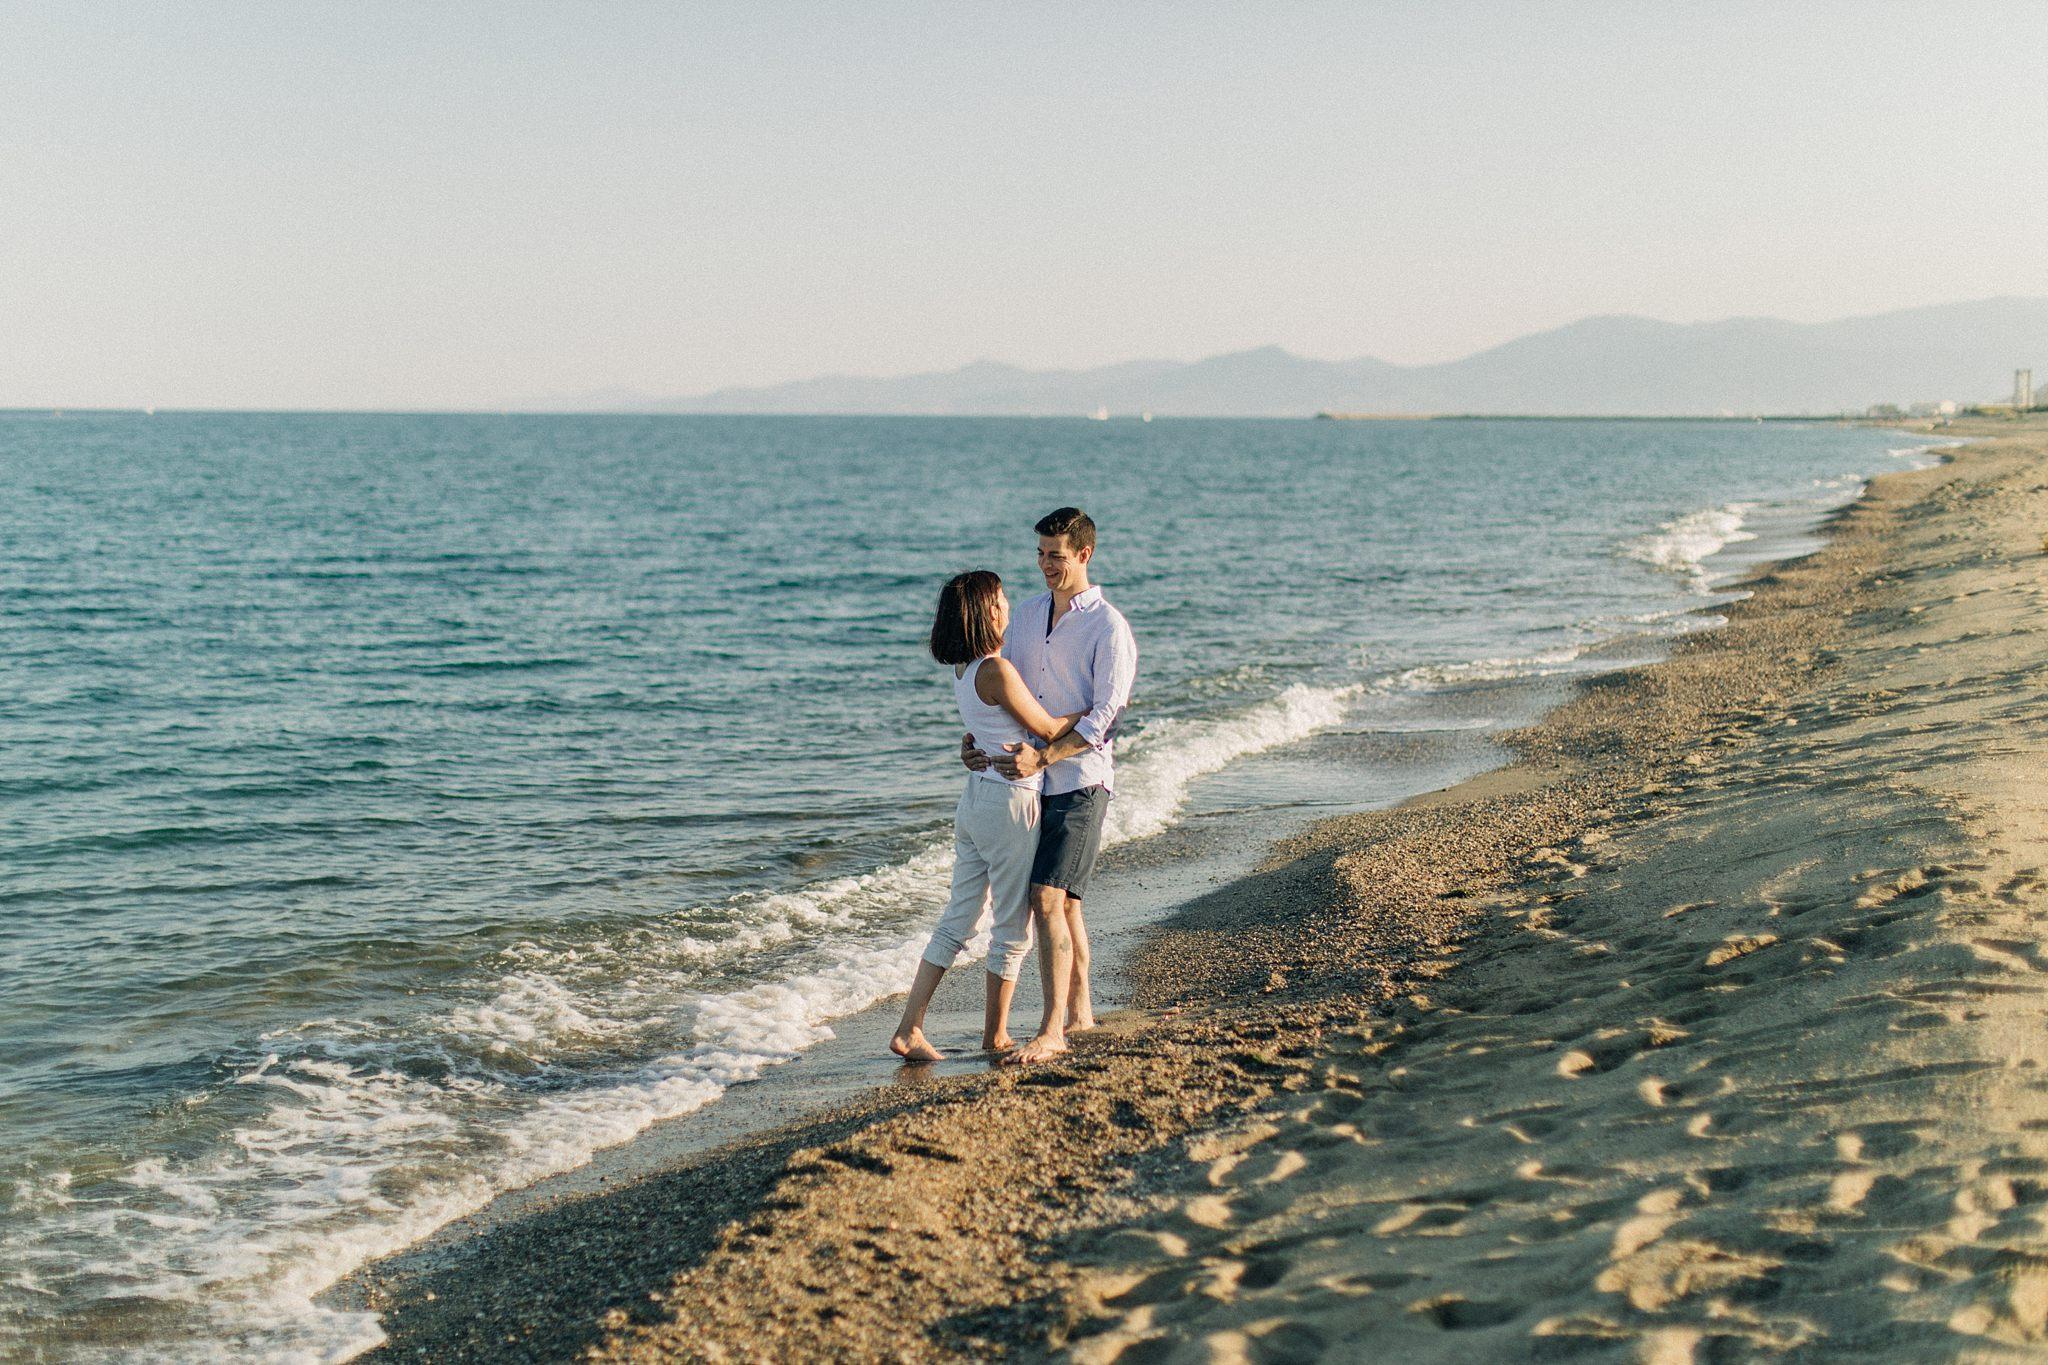 Mariage-a-la-maison-secall-hugo-hennequin-photographe-mariage-perpignan_0149.jpg